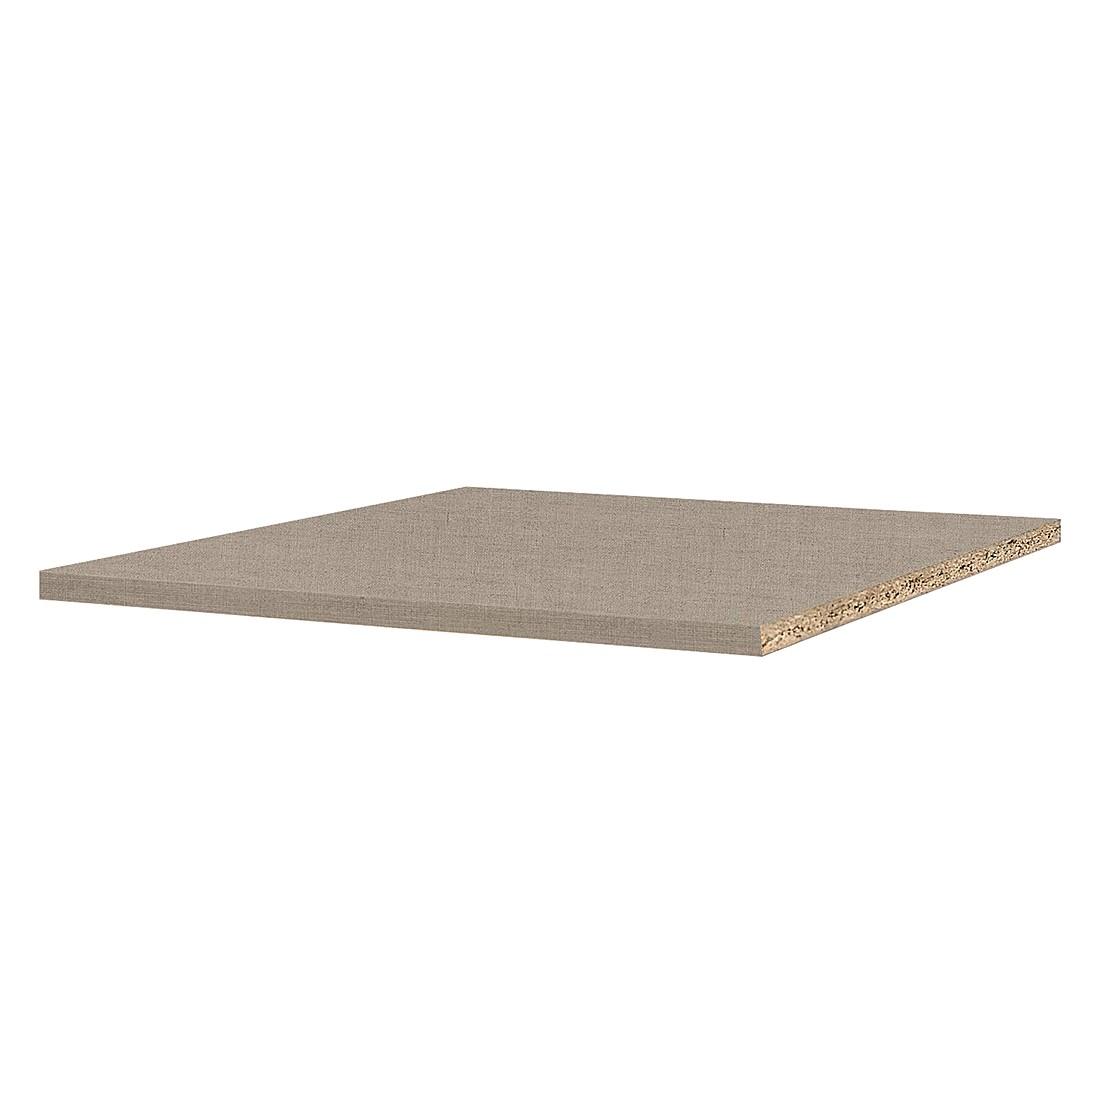 Inlegplanken voor breedte 90 cm diepte 54 of 56 cm, Rauch Packs